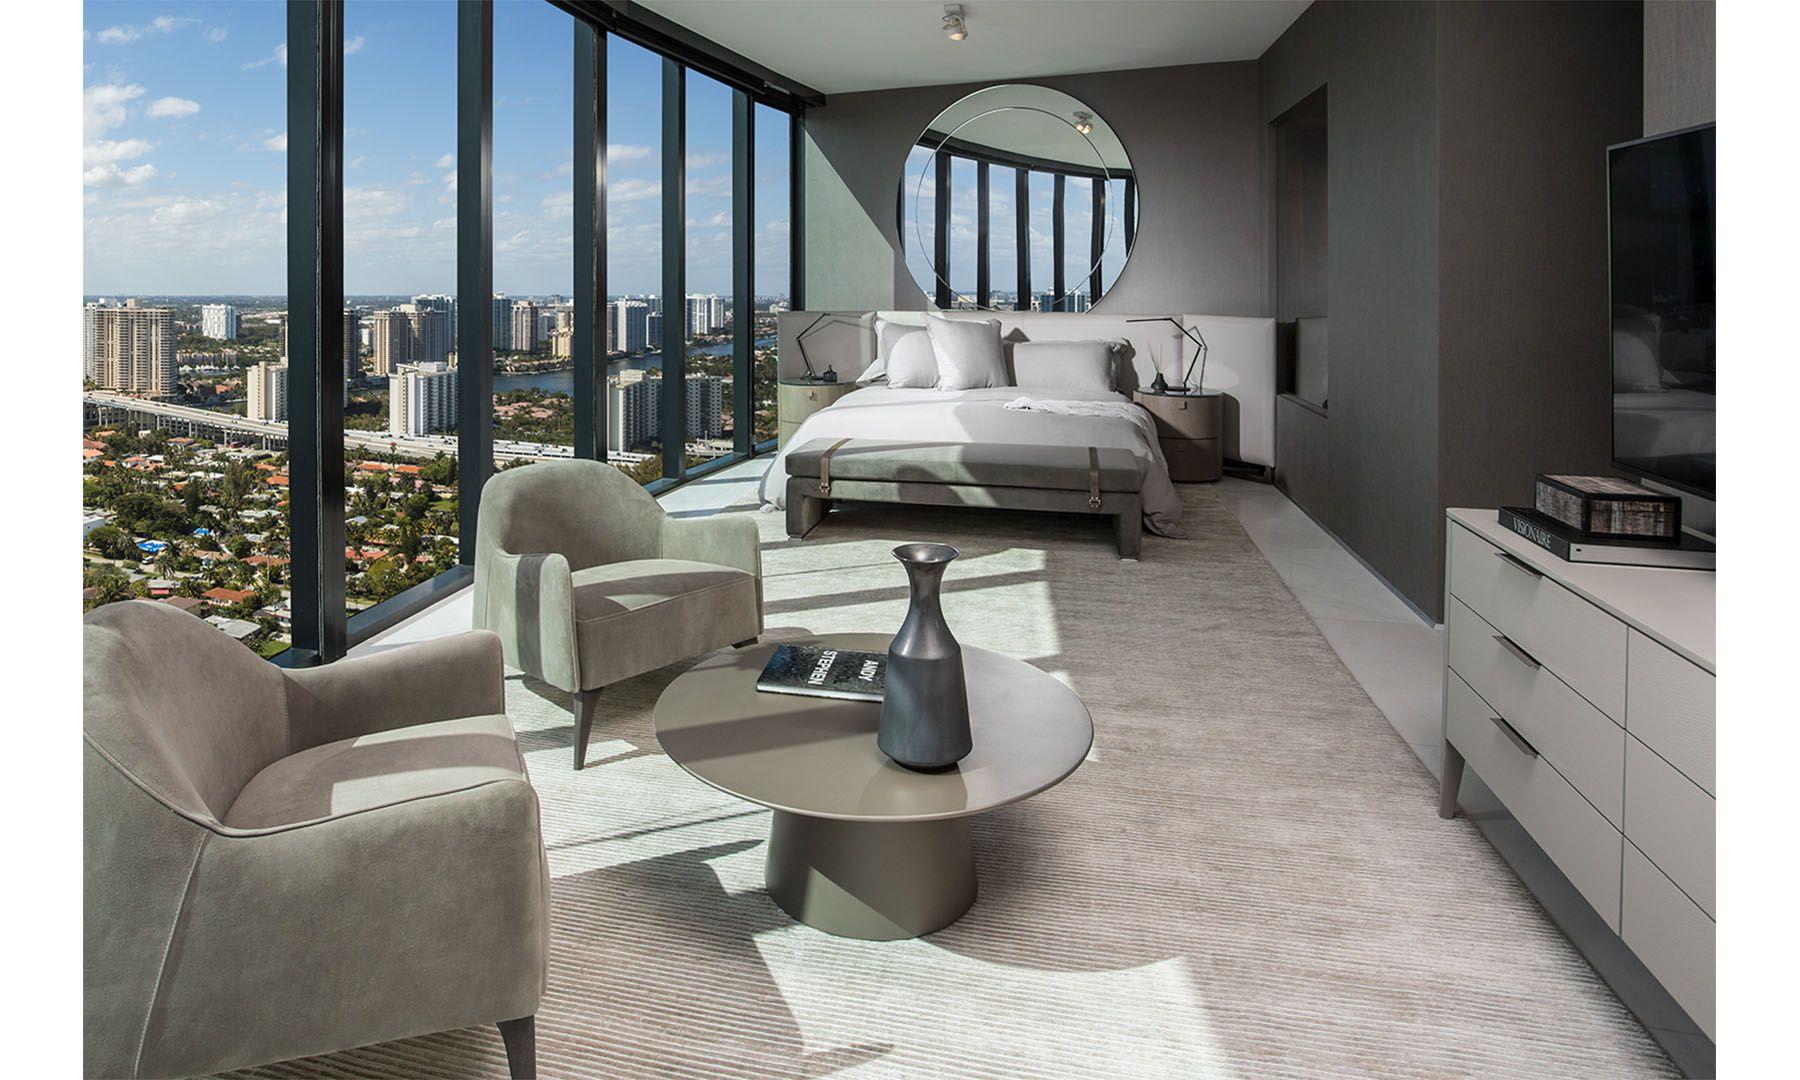 look inside a porsche design tower miami residence in 2019 luxury rh pinterest com